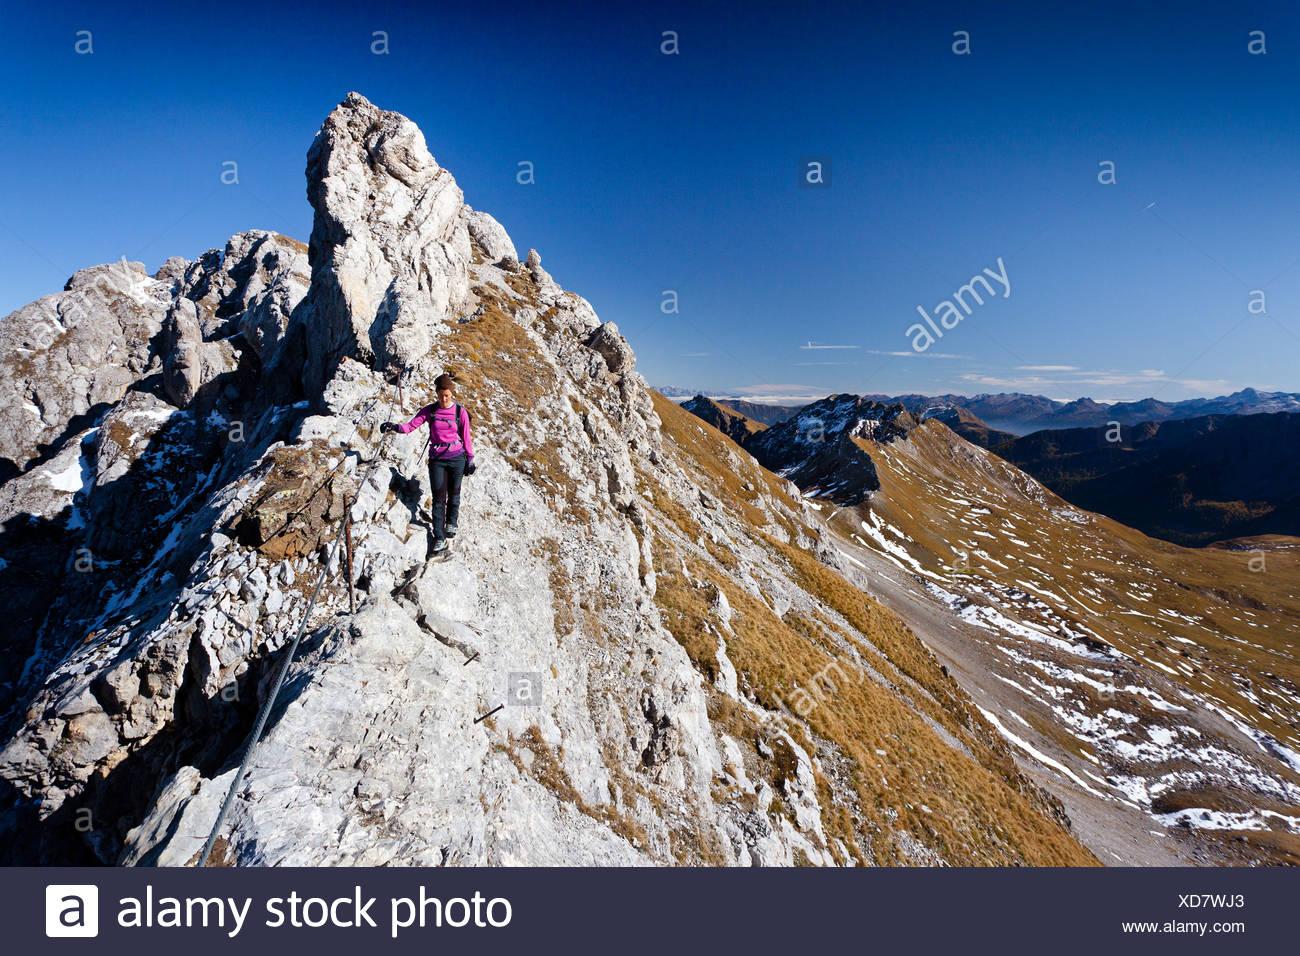 Climber on Bepi Zac climbing route in San Pellegrino Valley above San Pellegrino Pass, overlooking the Bervagabunden Hut Stock Photo